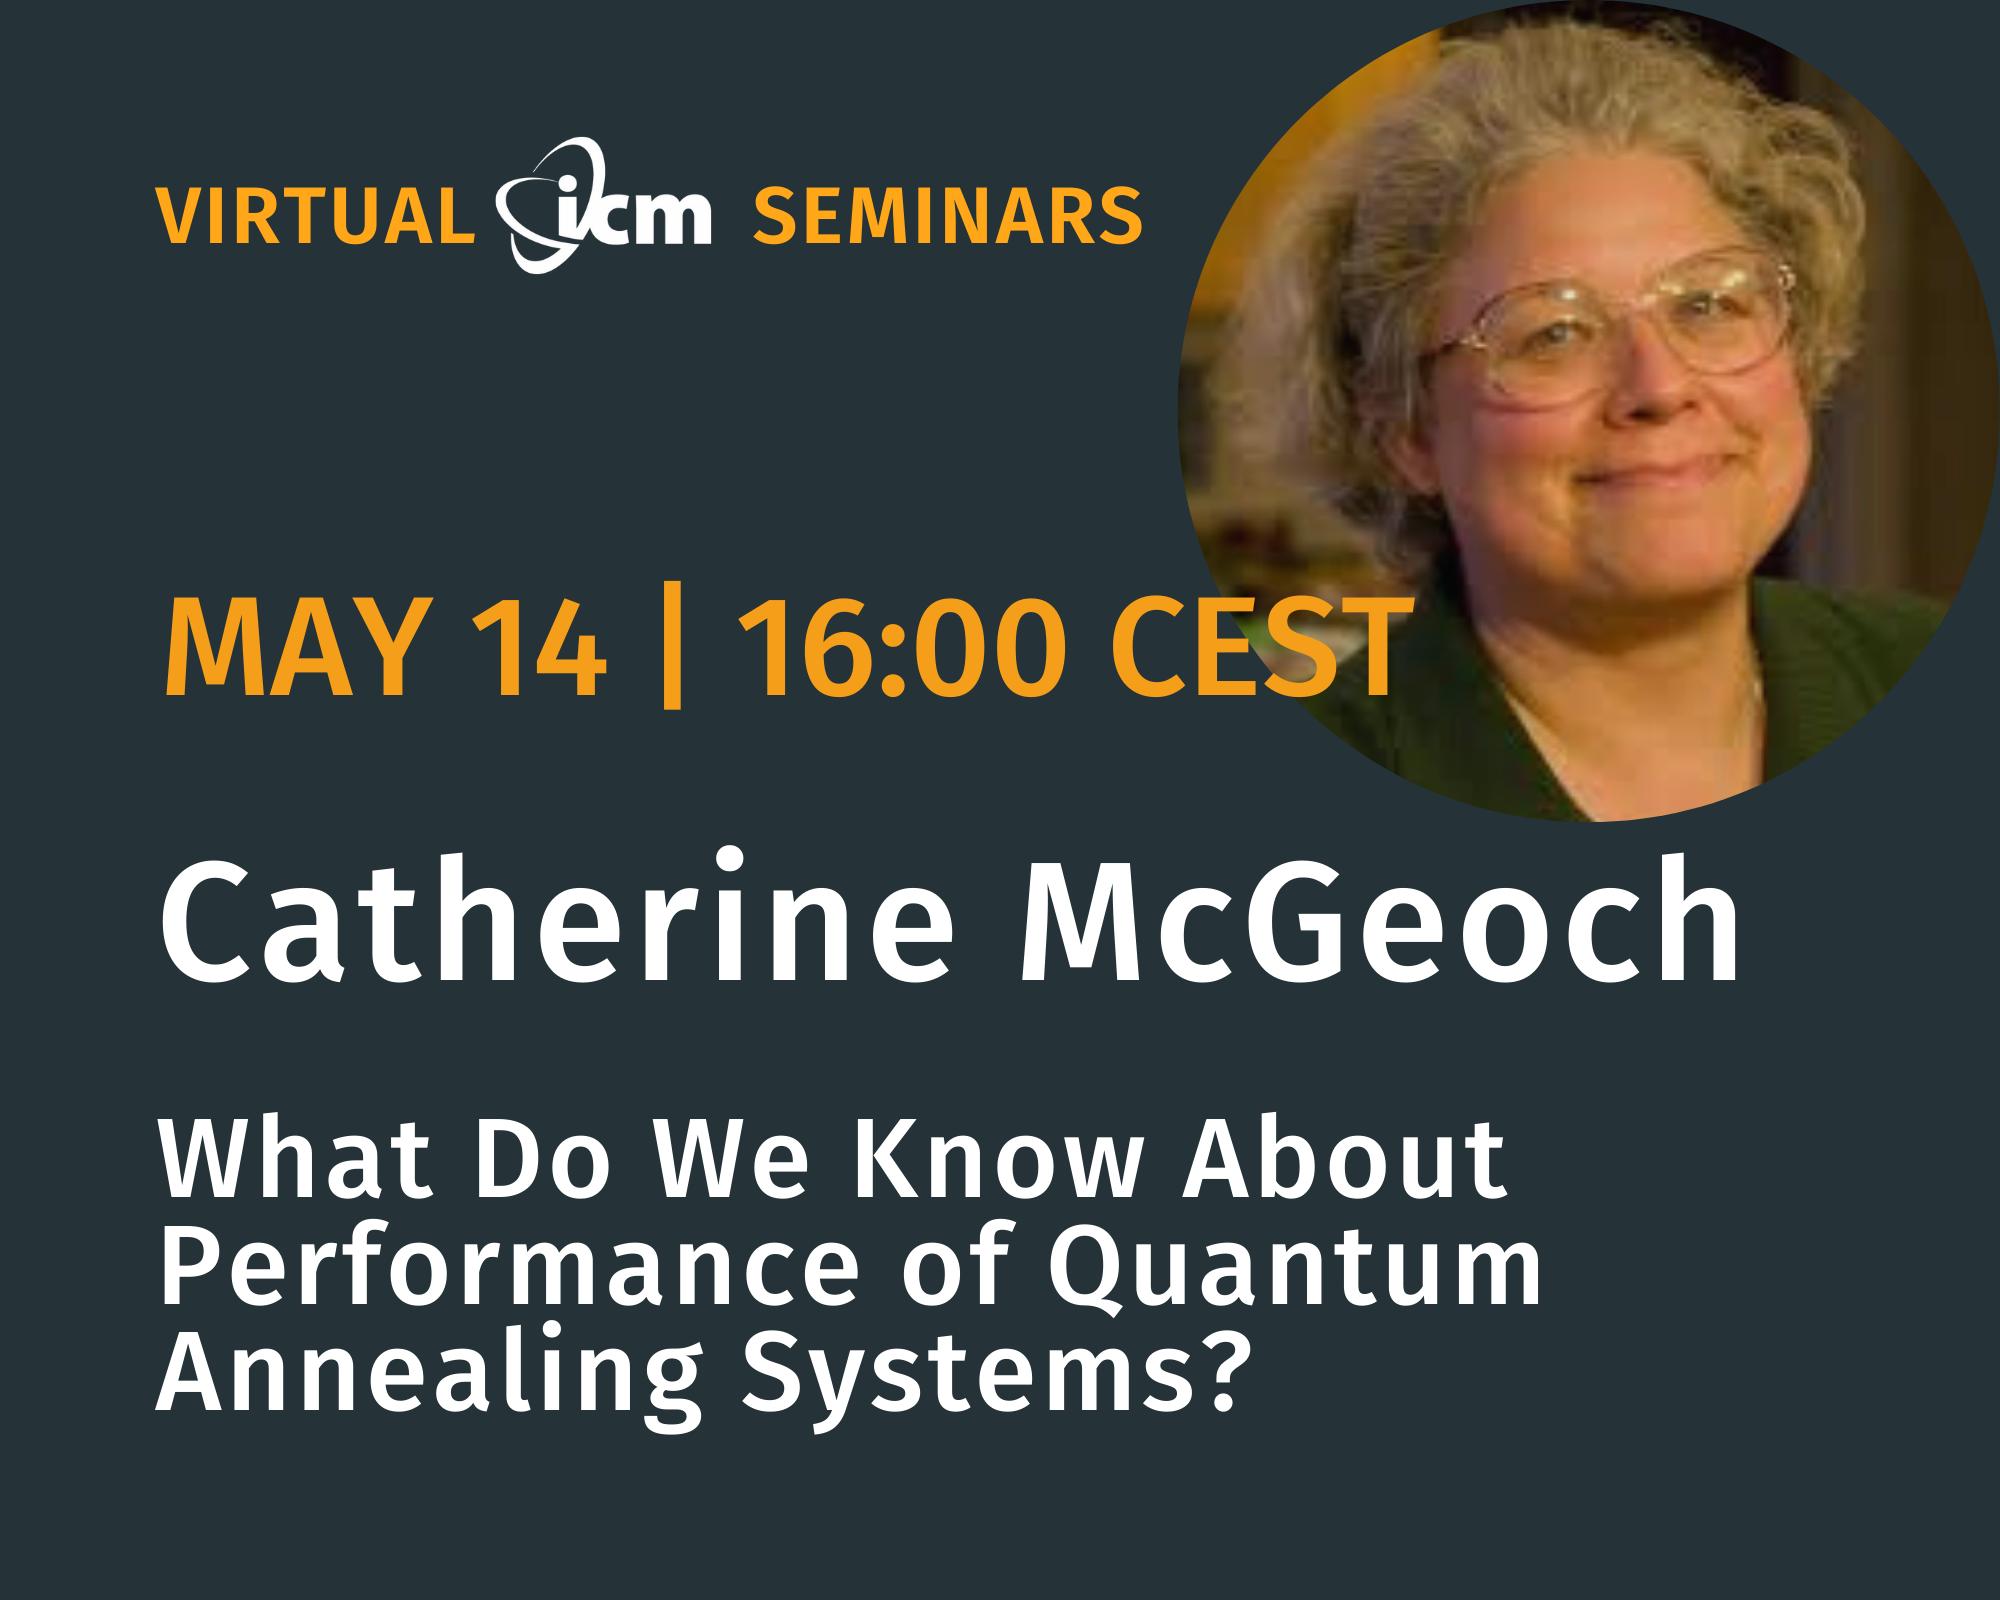 Catherine McGeoch ICM Seminars May 14 2020